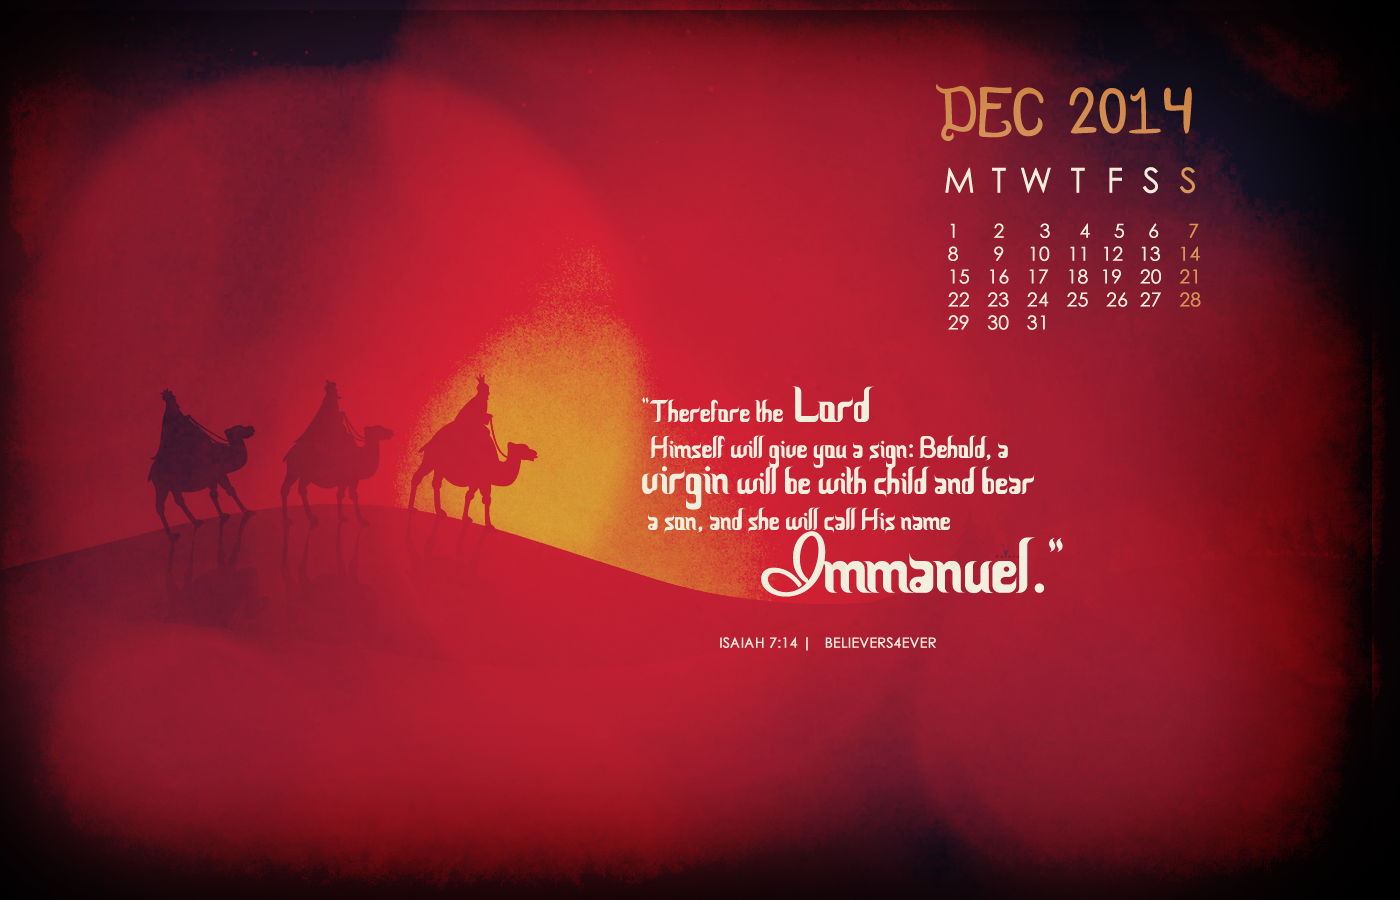 Immanuel Christian Christmas wallpaper